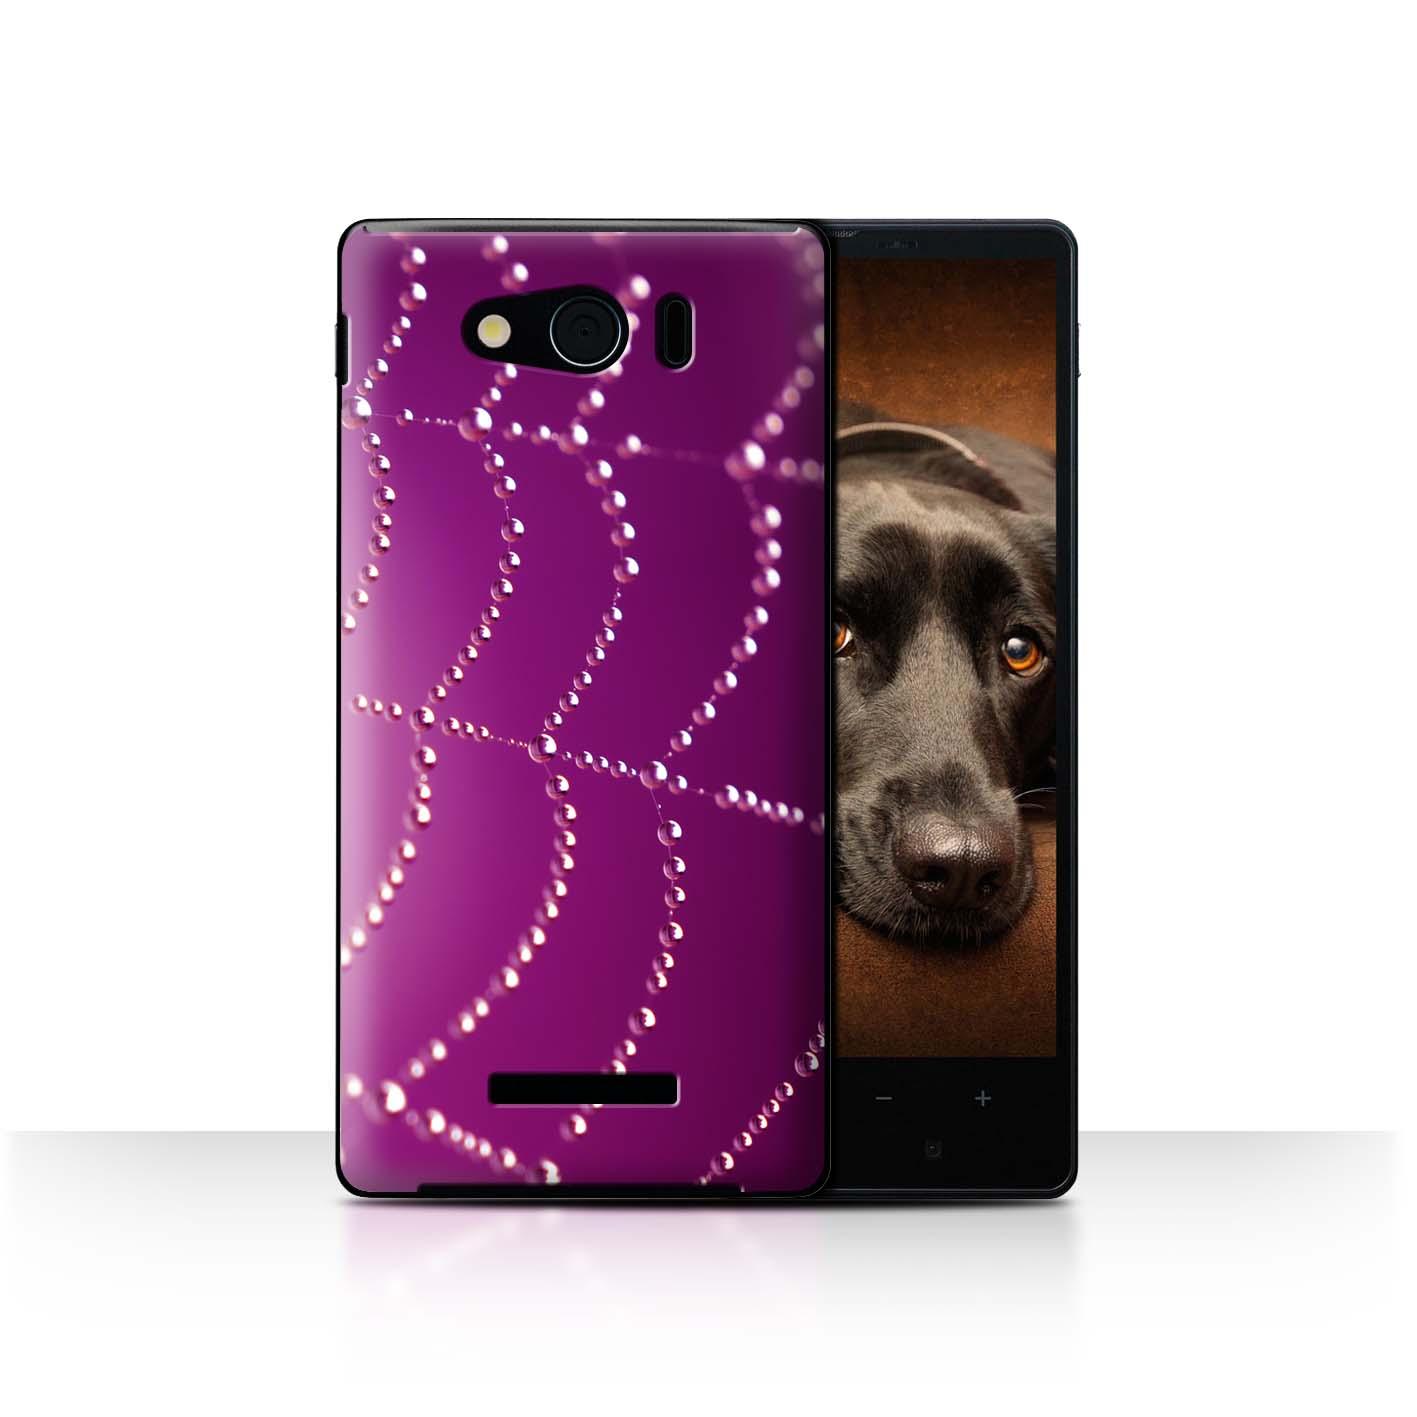 STUFF4-Back-Case-Cover-Skin-for-Sharp-Aquos-Xx-Mini-303SH-Spider-Web-Pearls